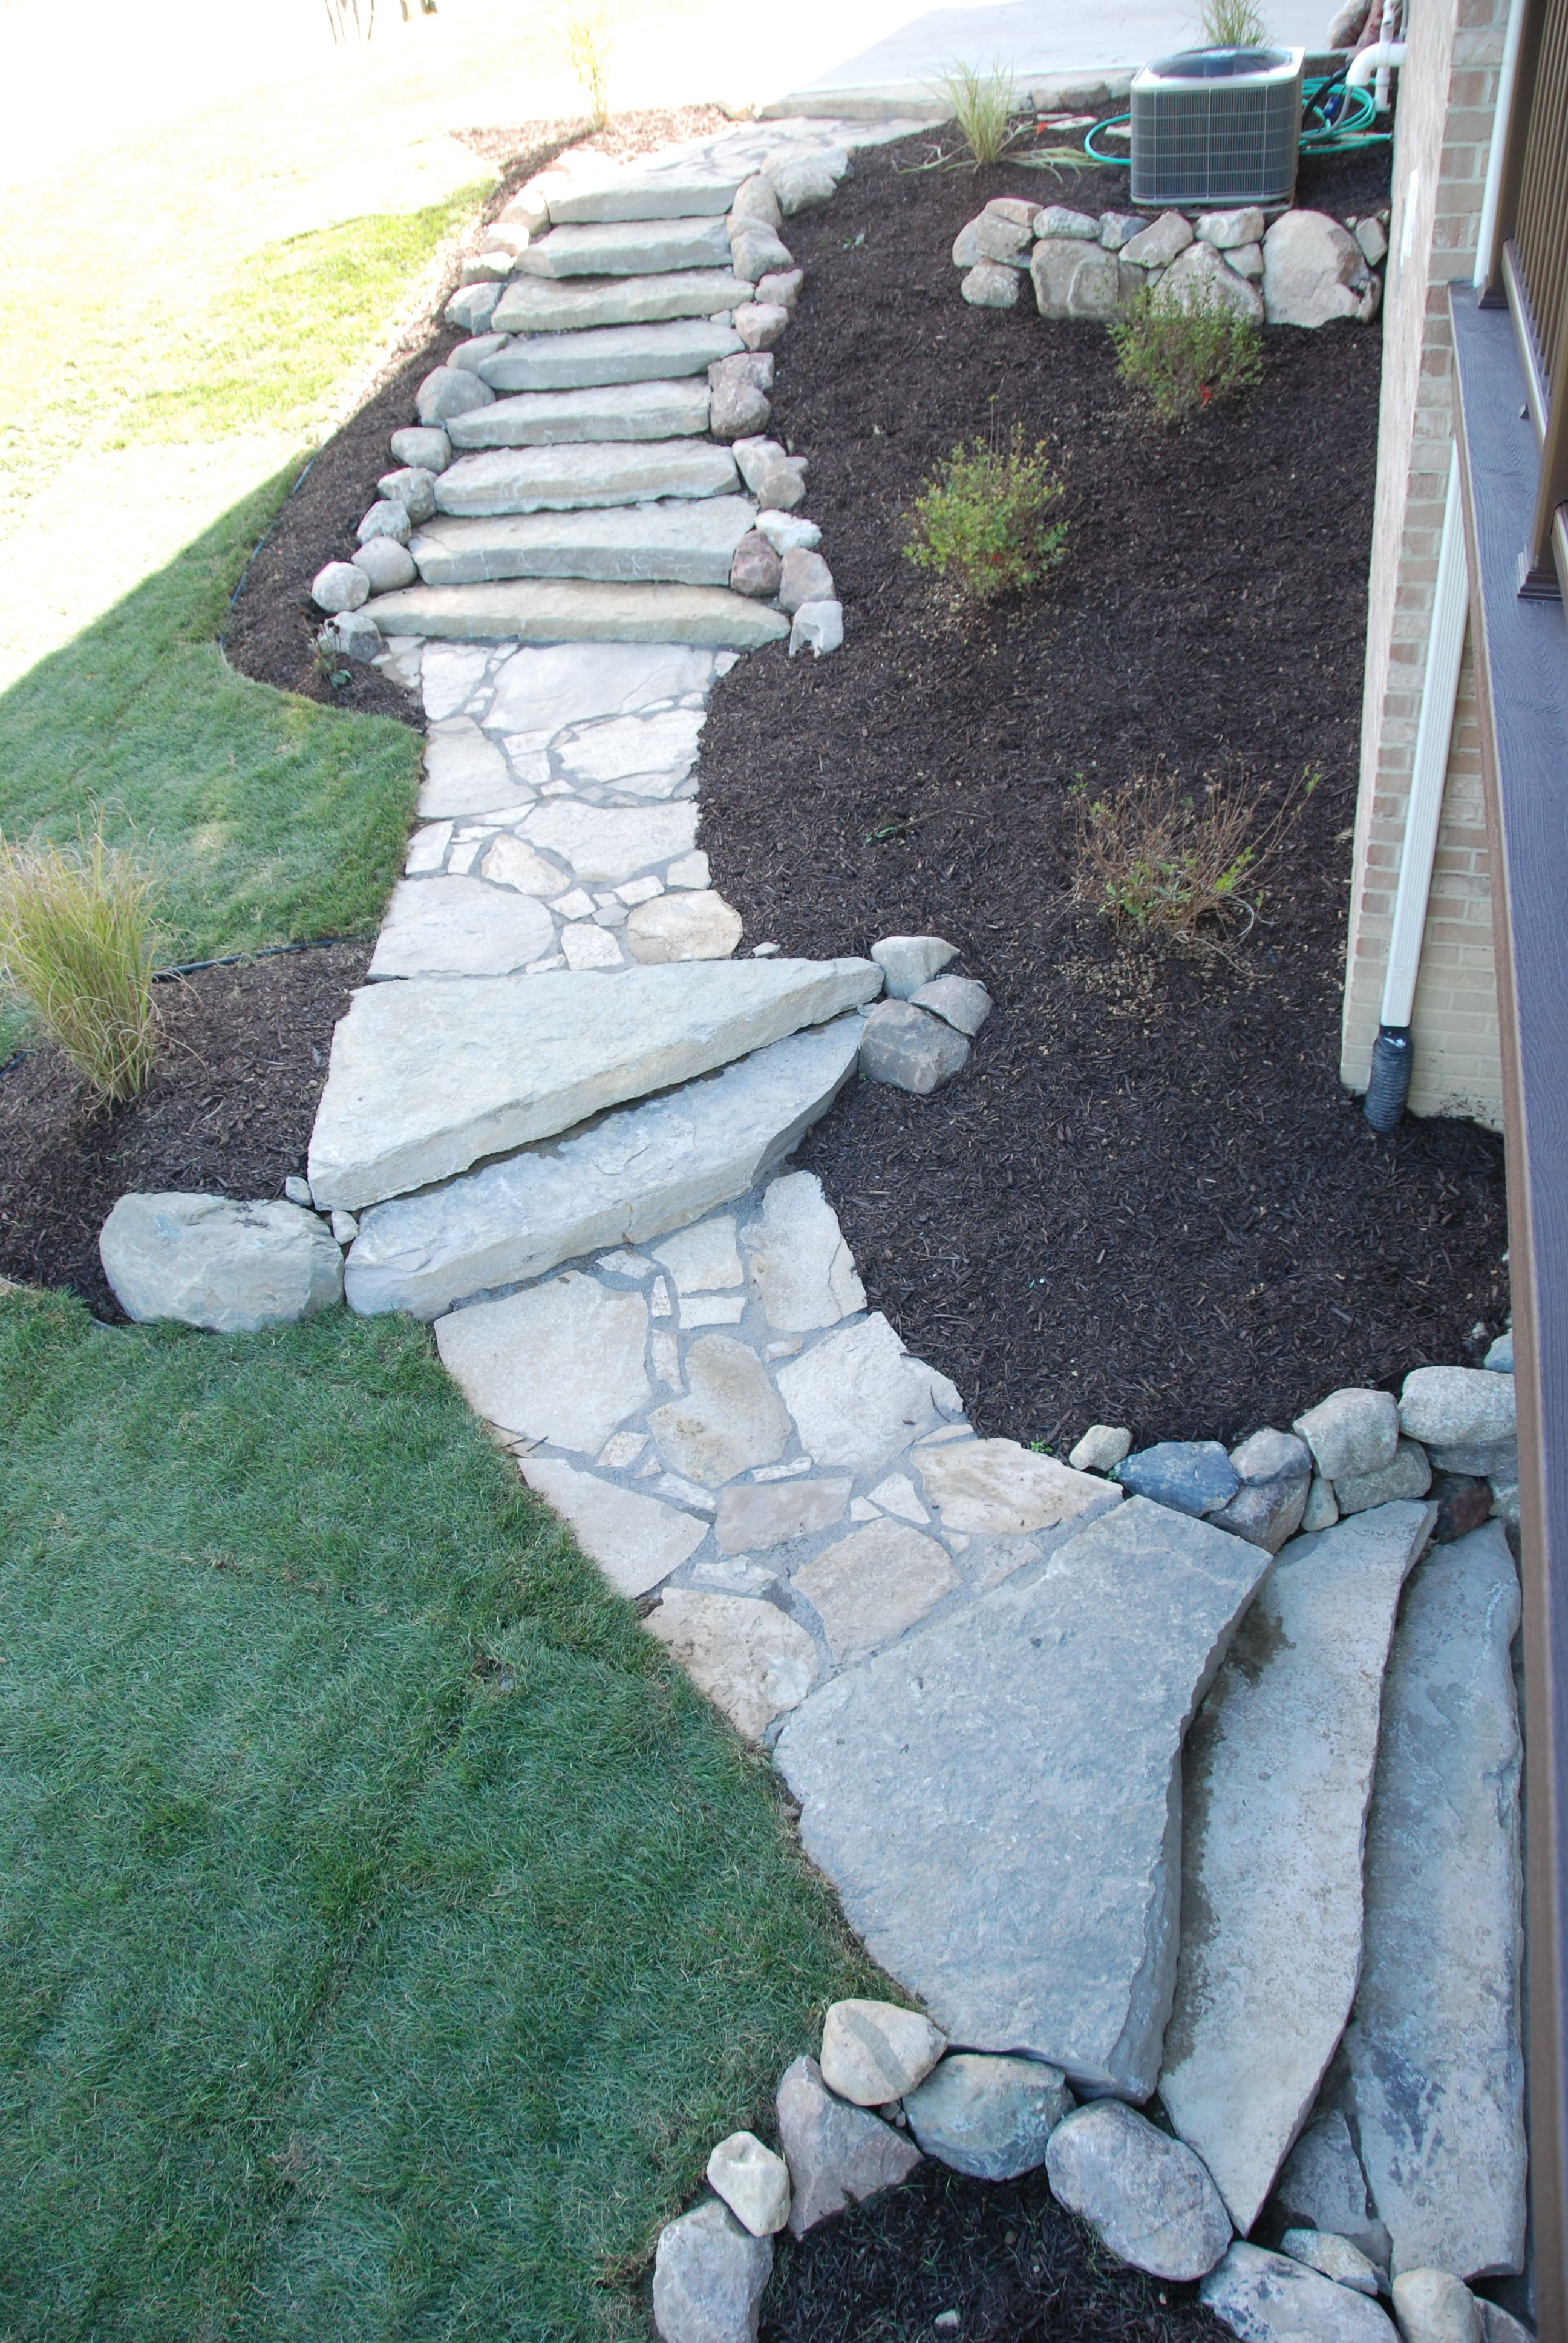 Canadian Flagstone Walkway And Limestone Steps. Unilock Brick Paver Pillar  Diamond Cut. Design And